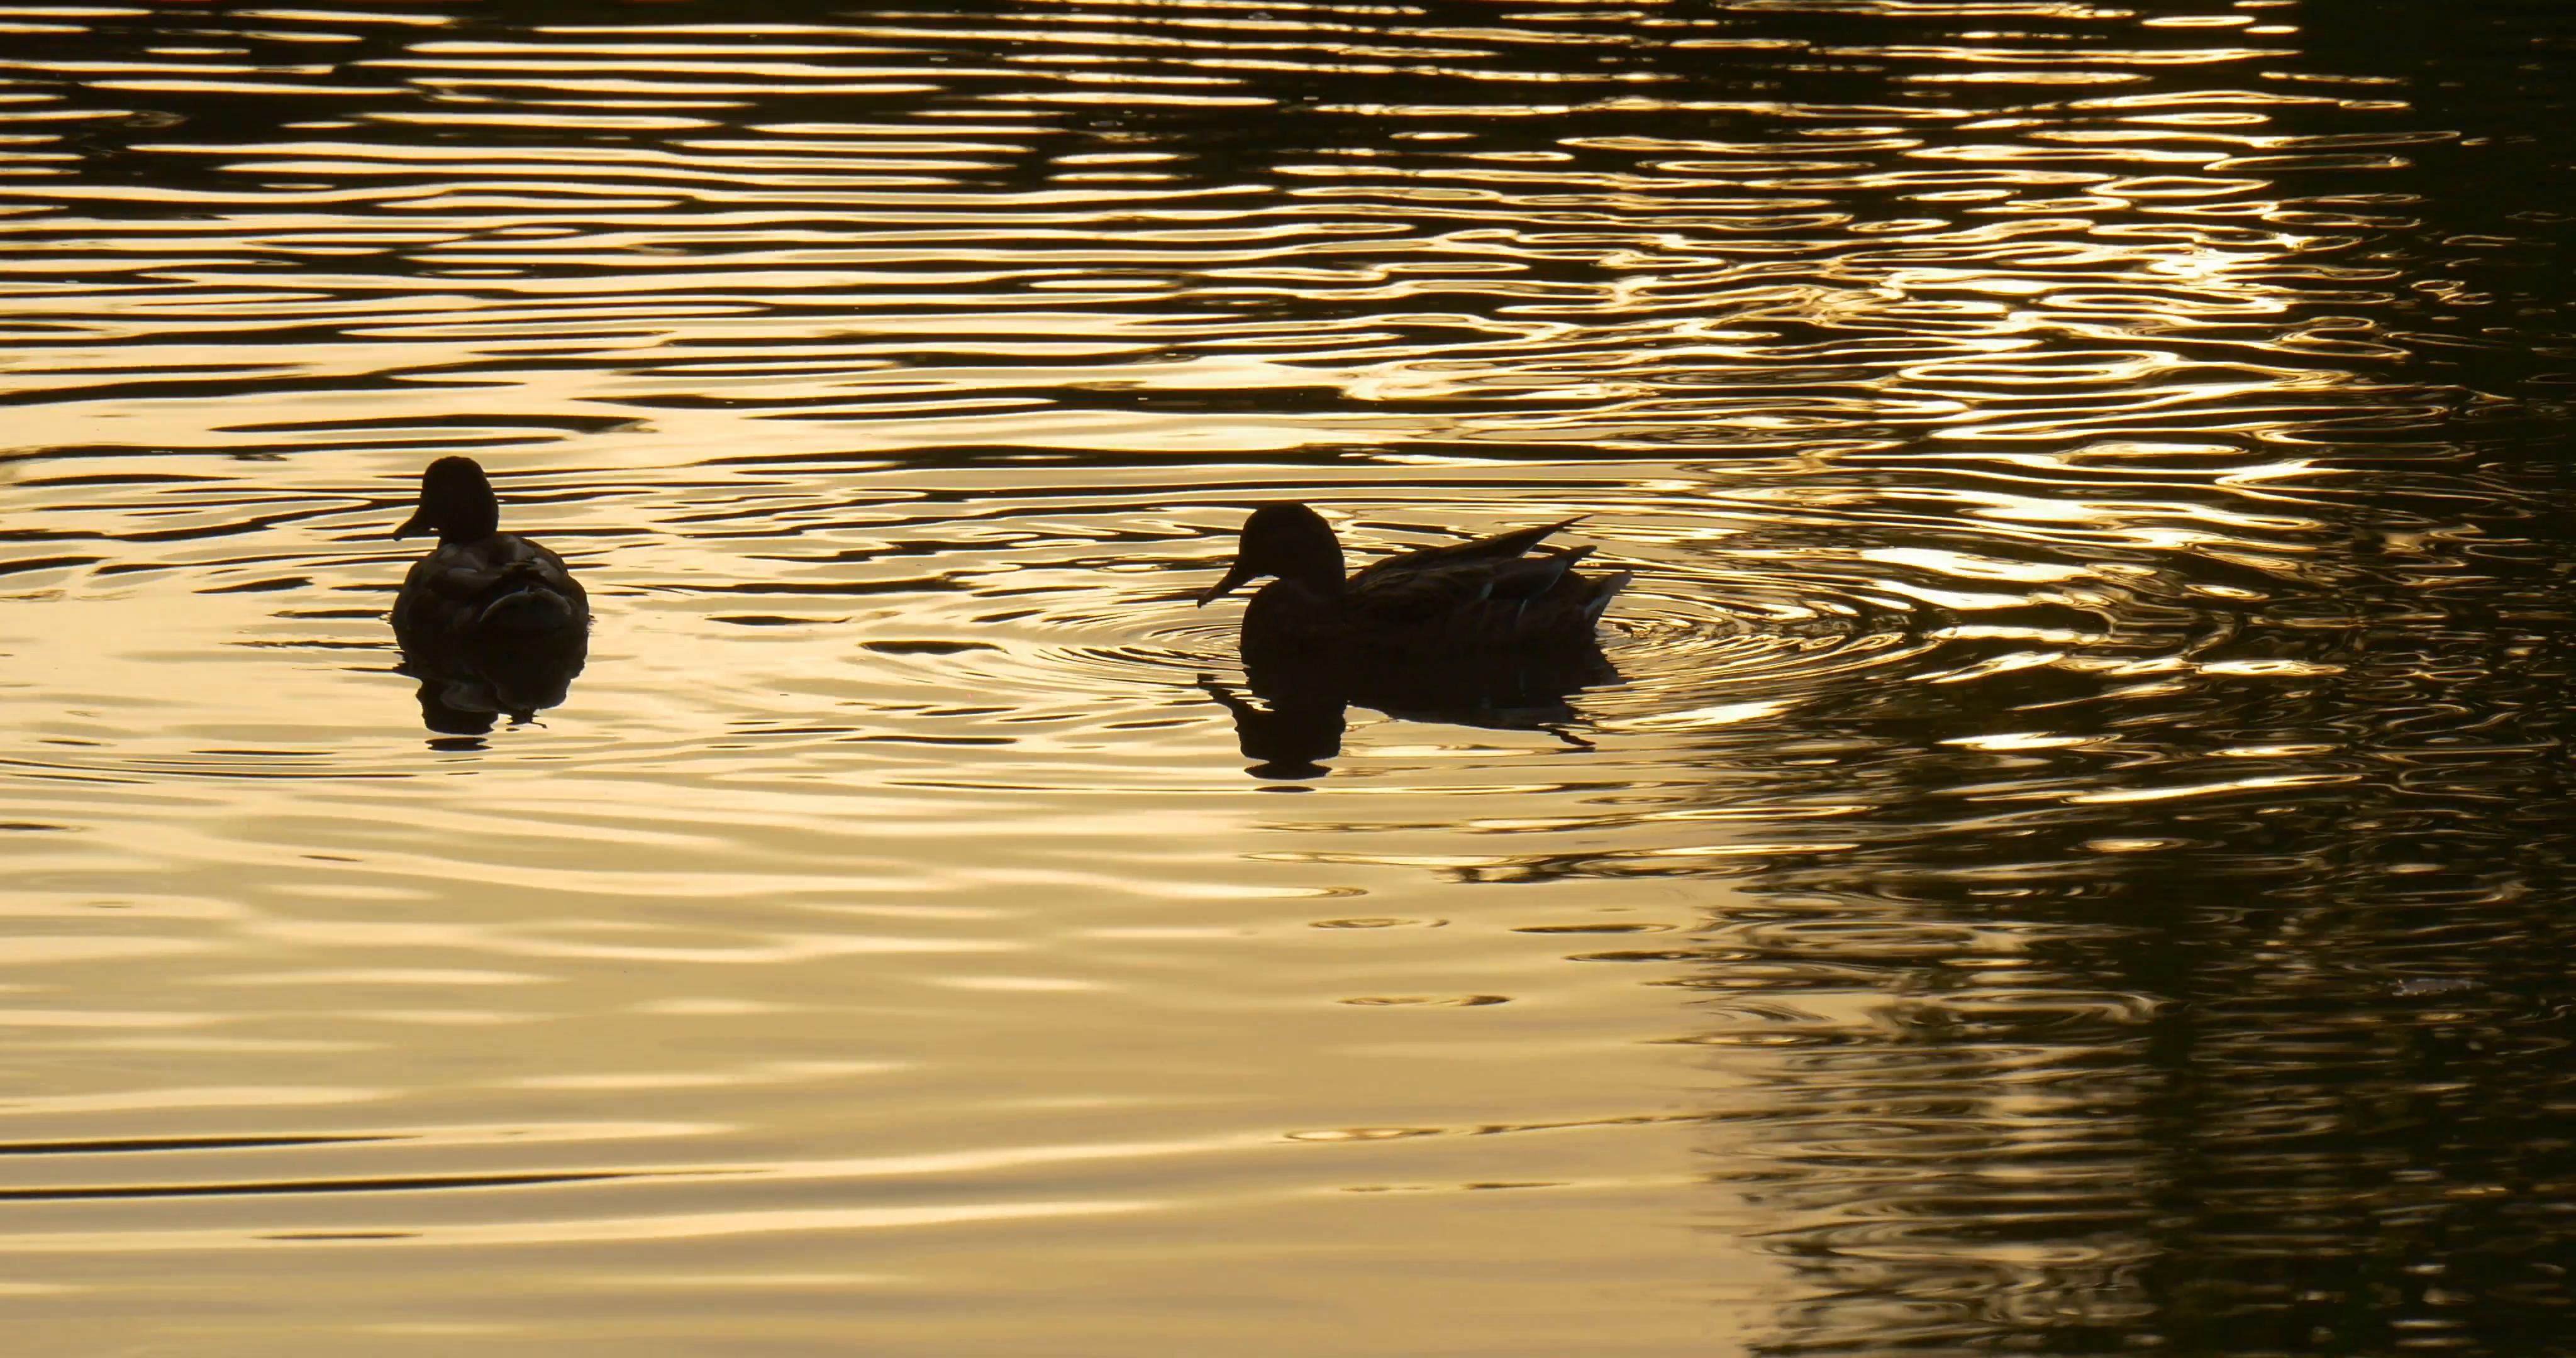 Two ducks photo